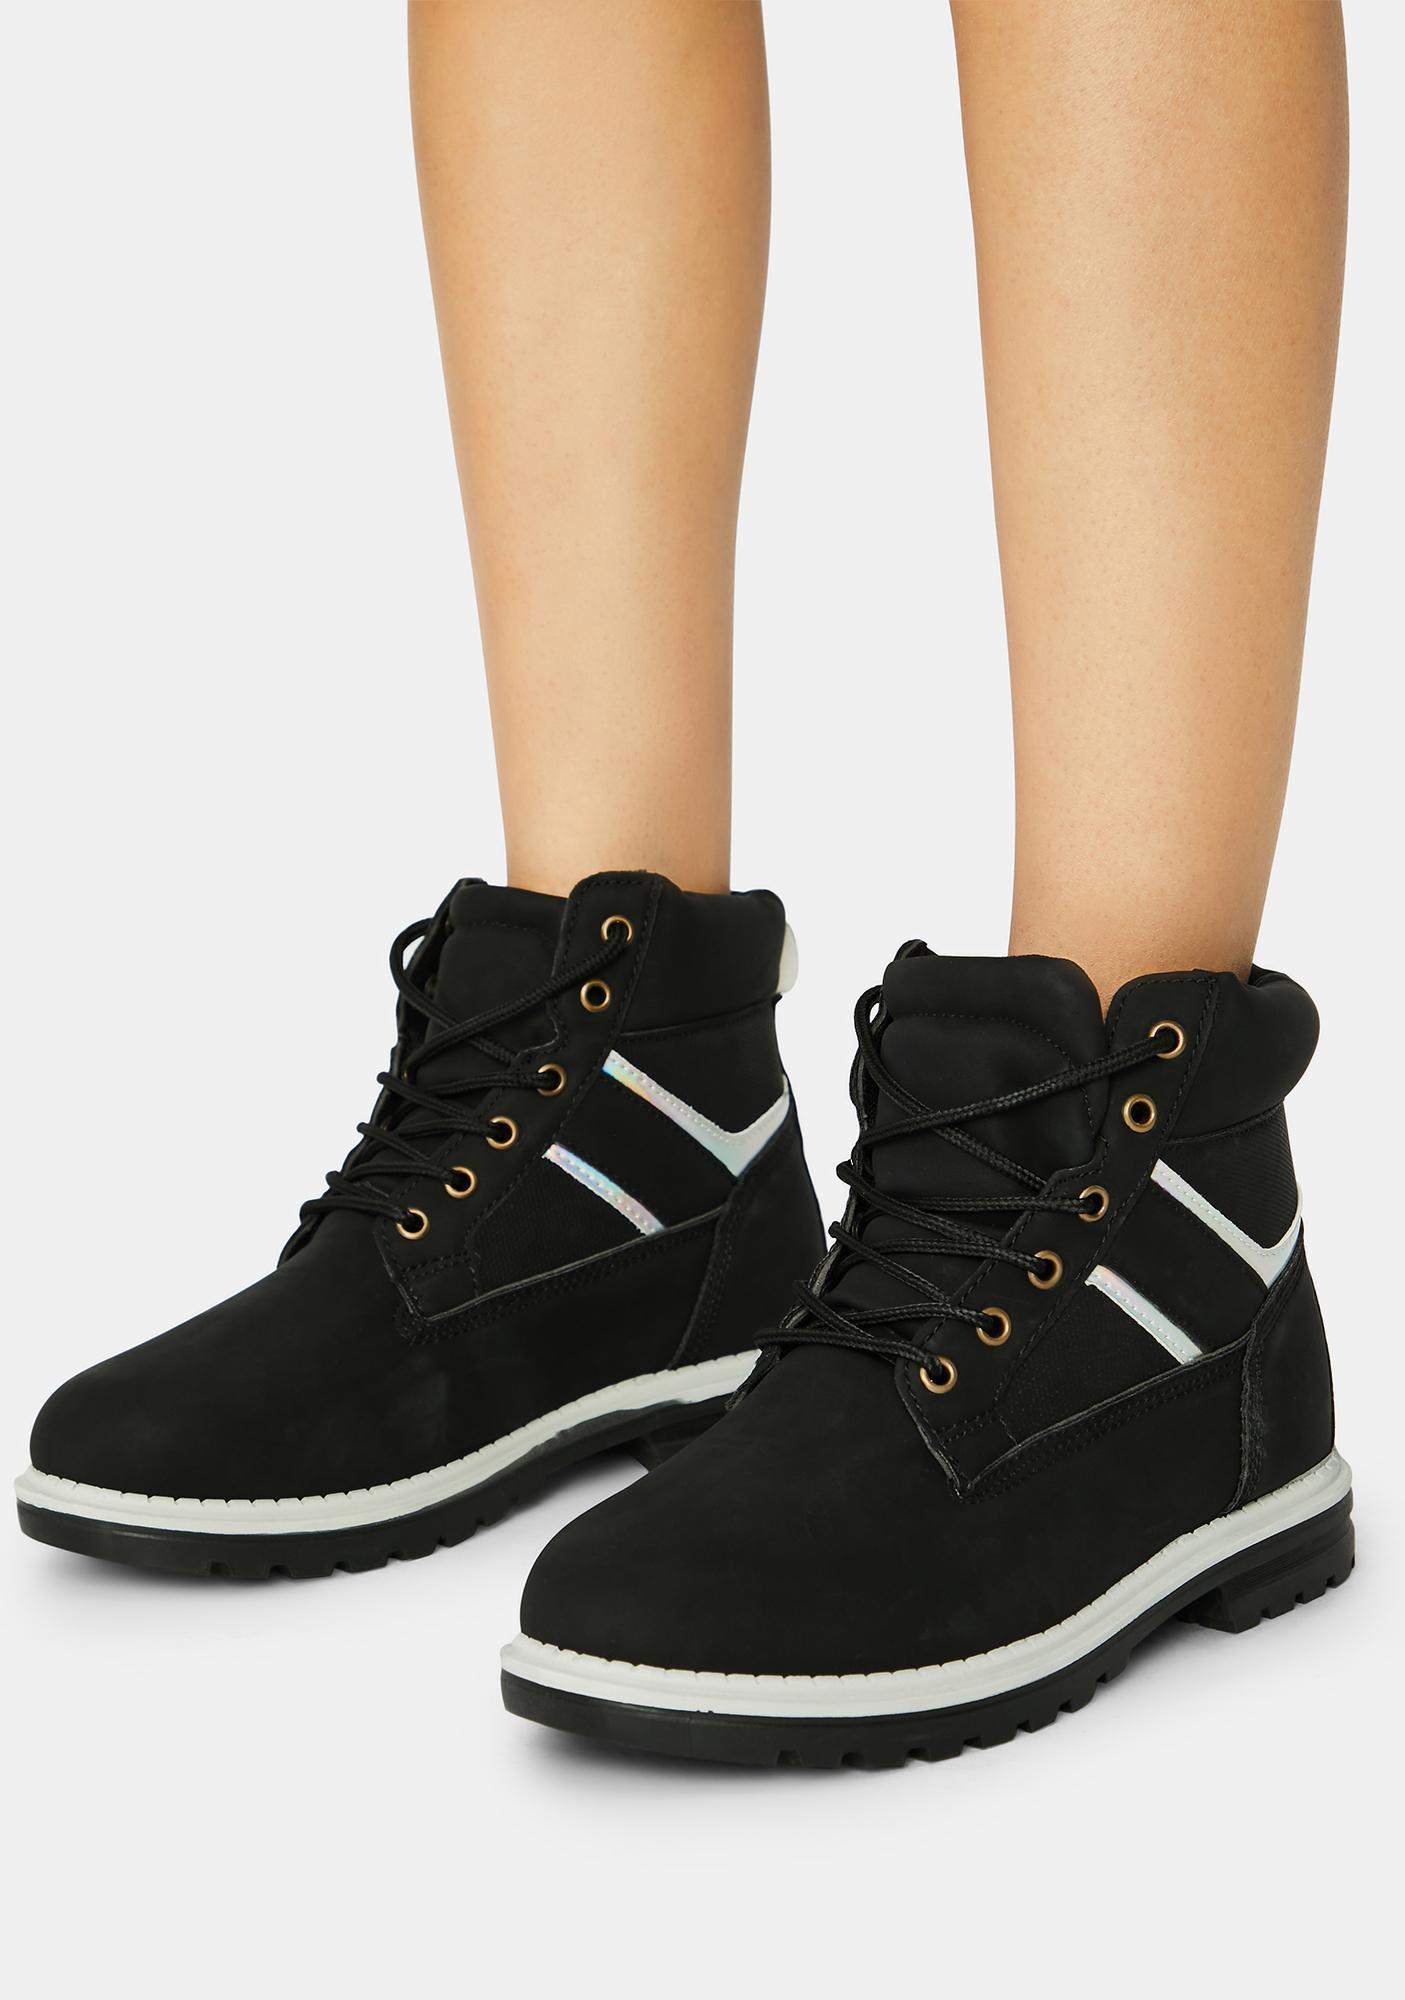 Brooklyn Bad Sneaker Boots